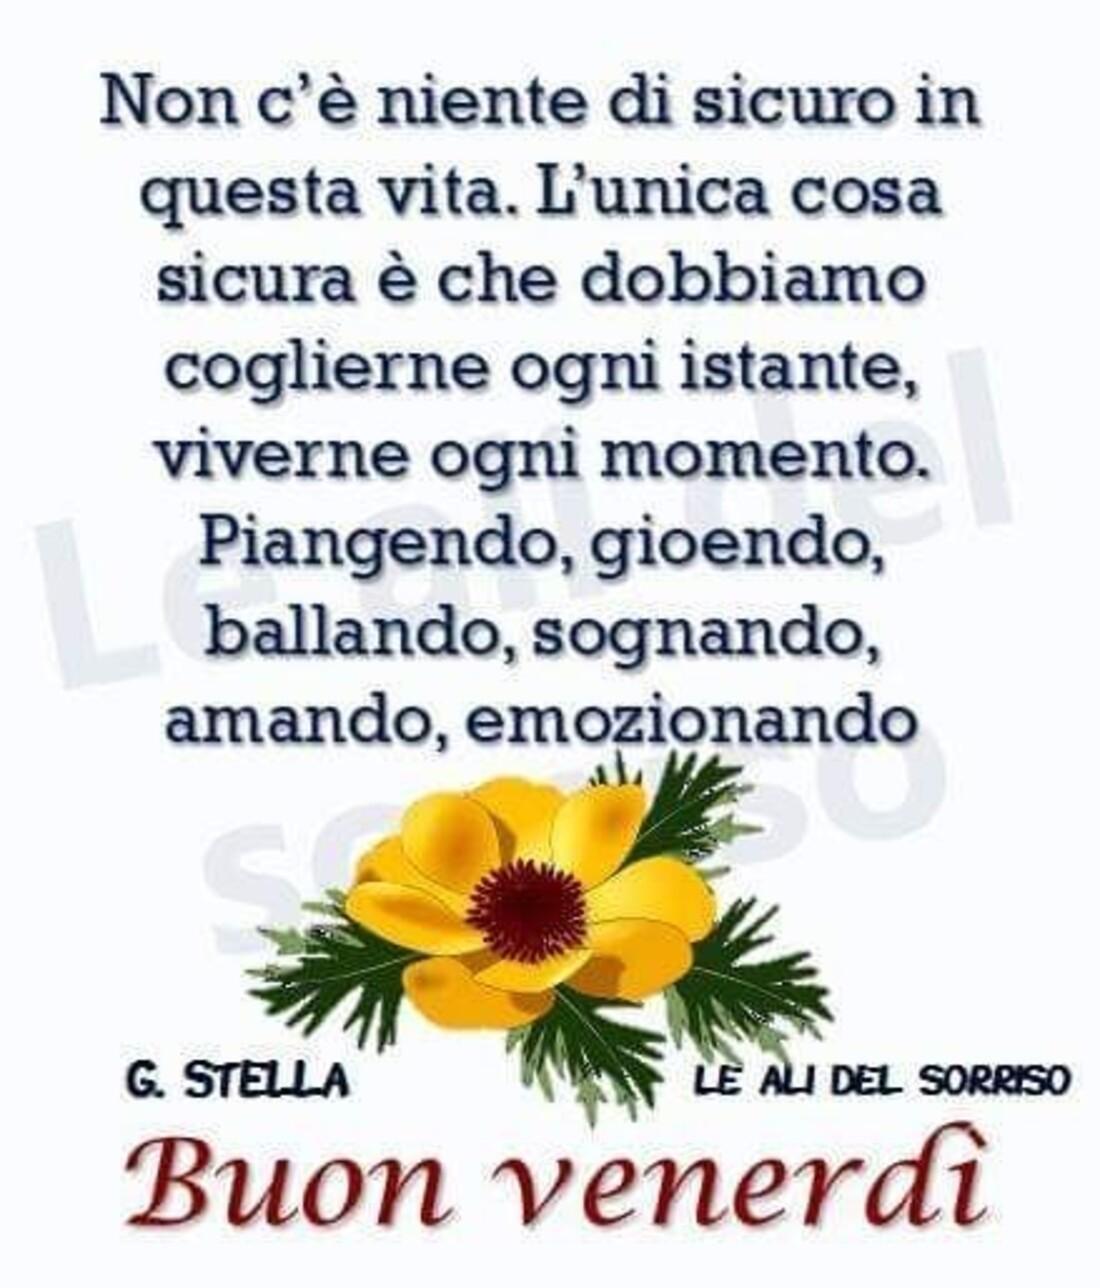 200 Buon Venerdì Bellissime Immagini E Frasi